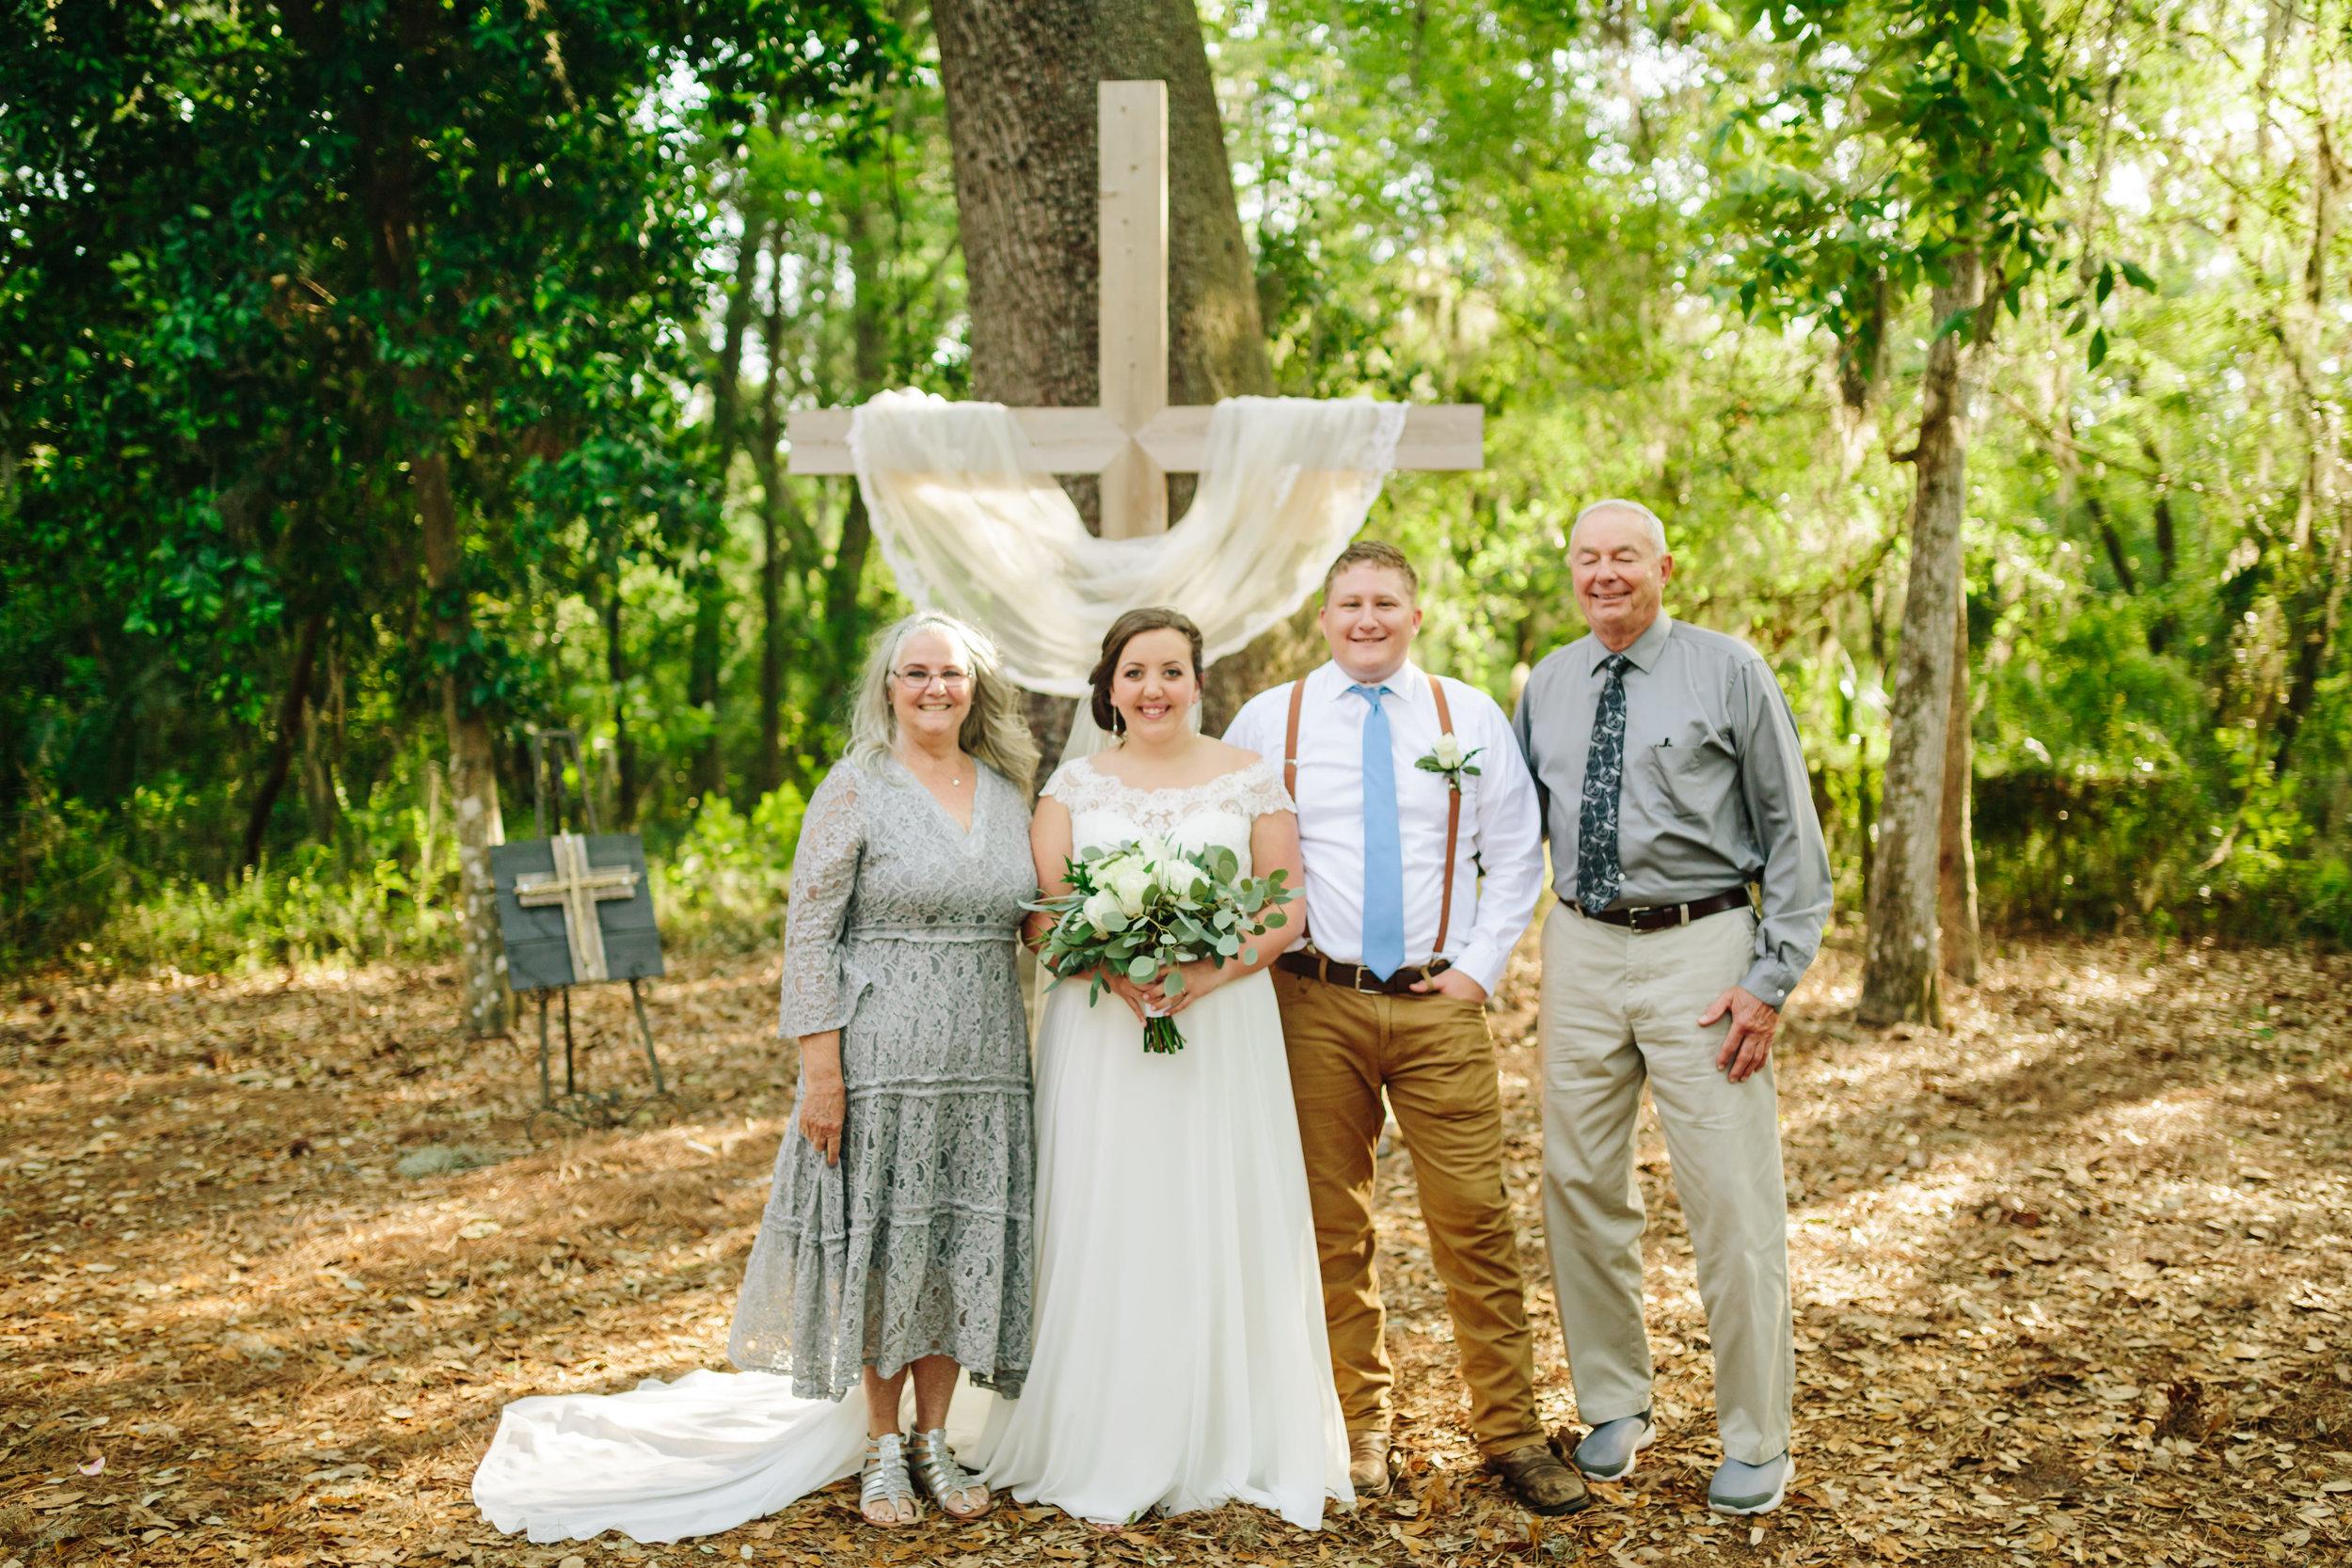 Griffin Wedding October Oaks Farm-385.jpg